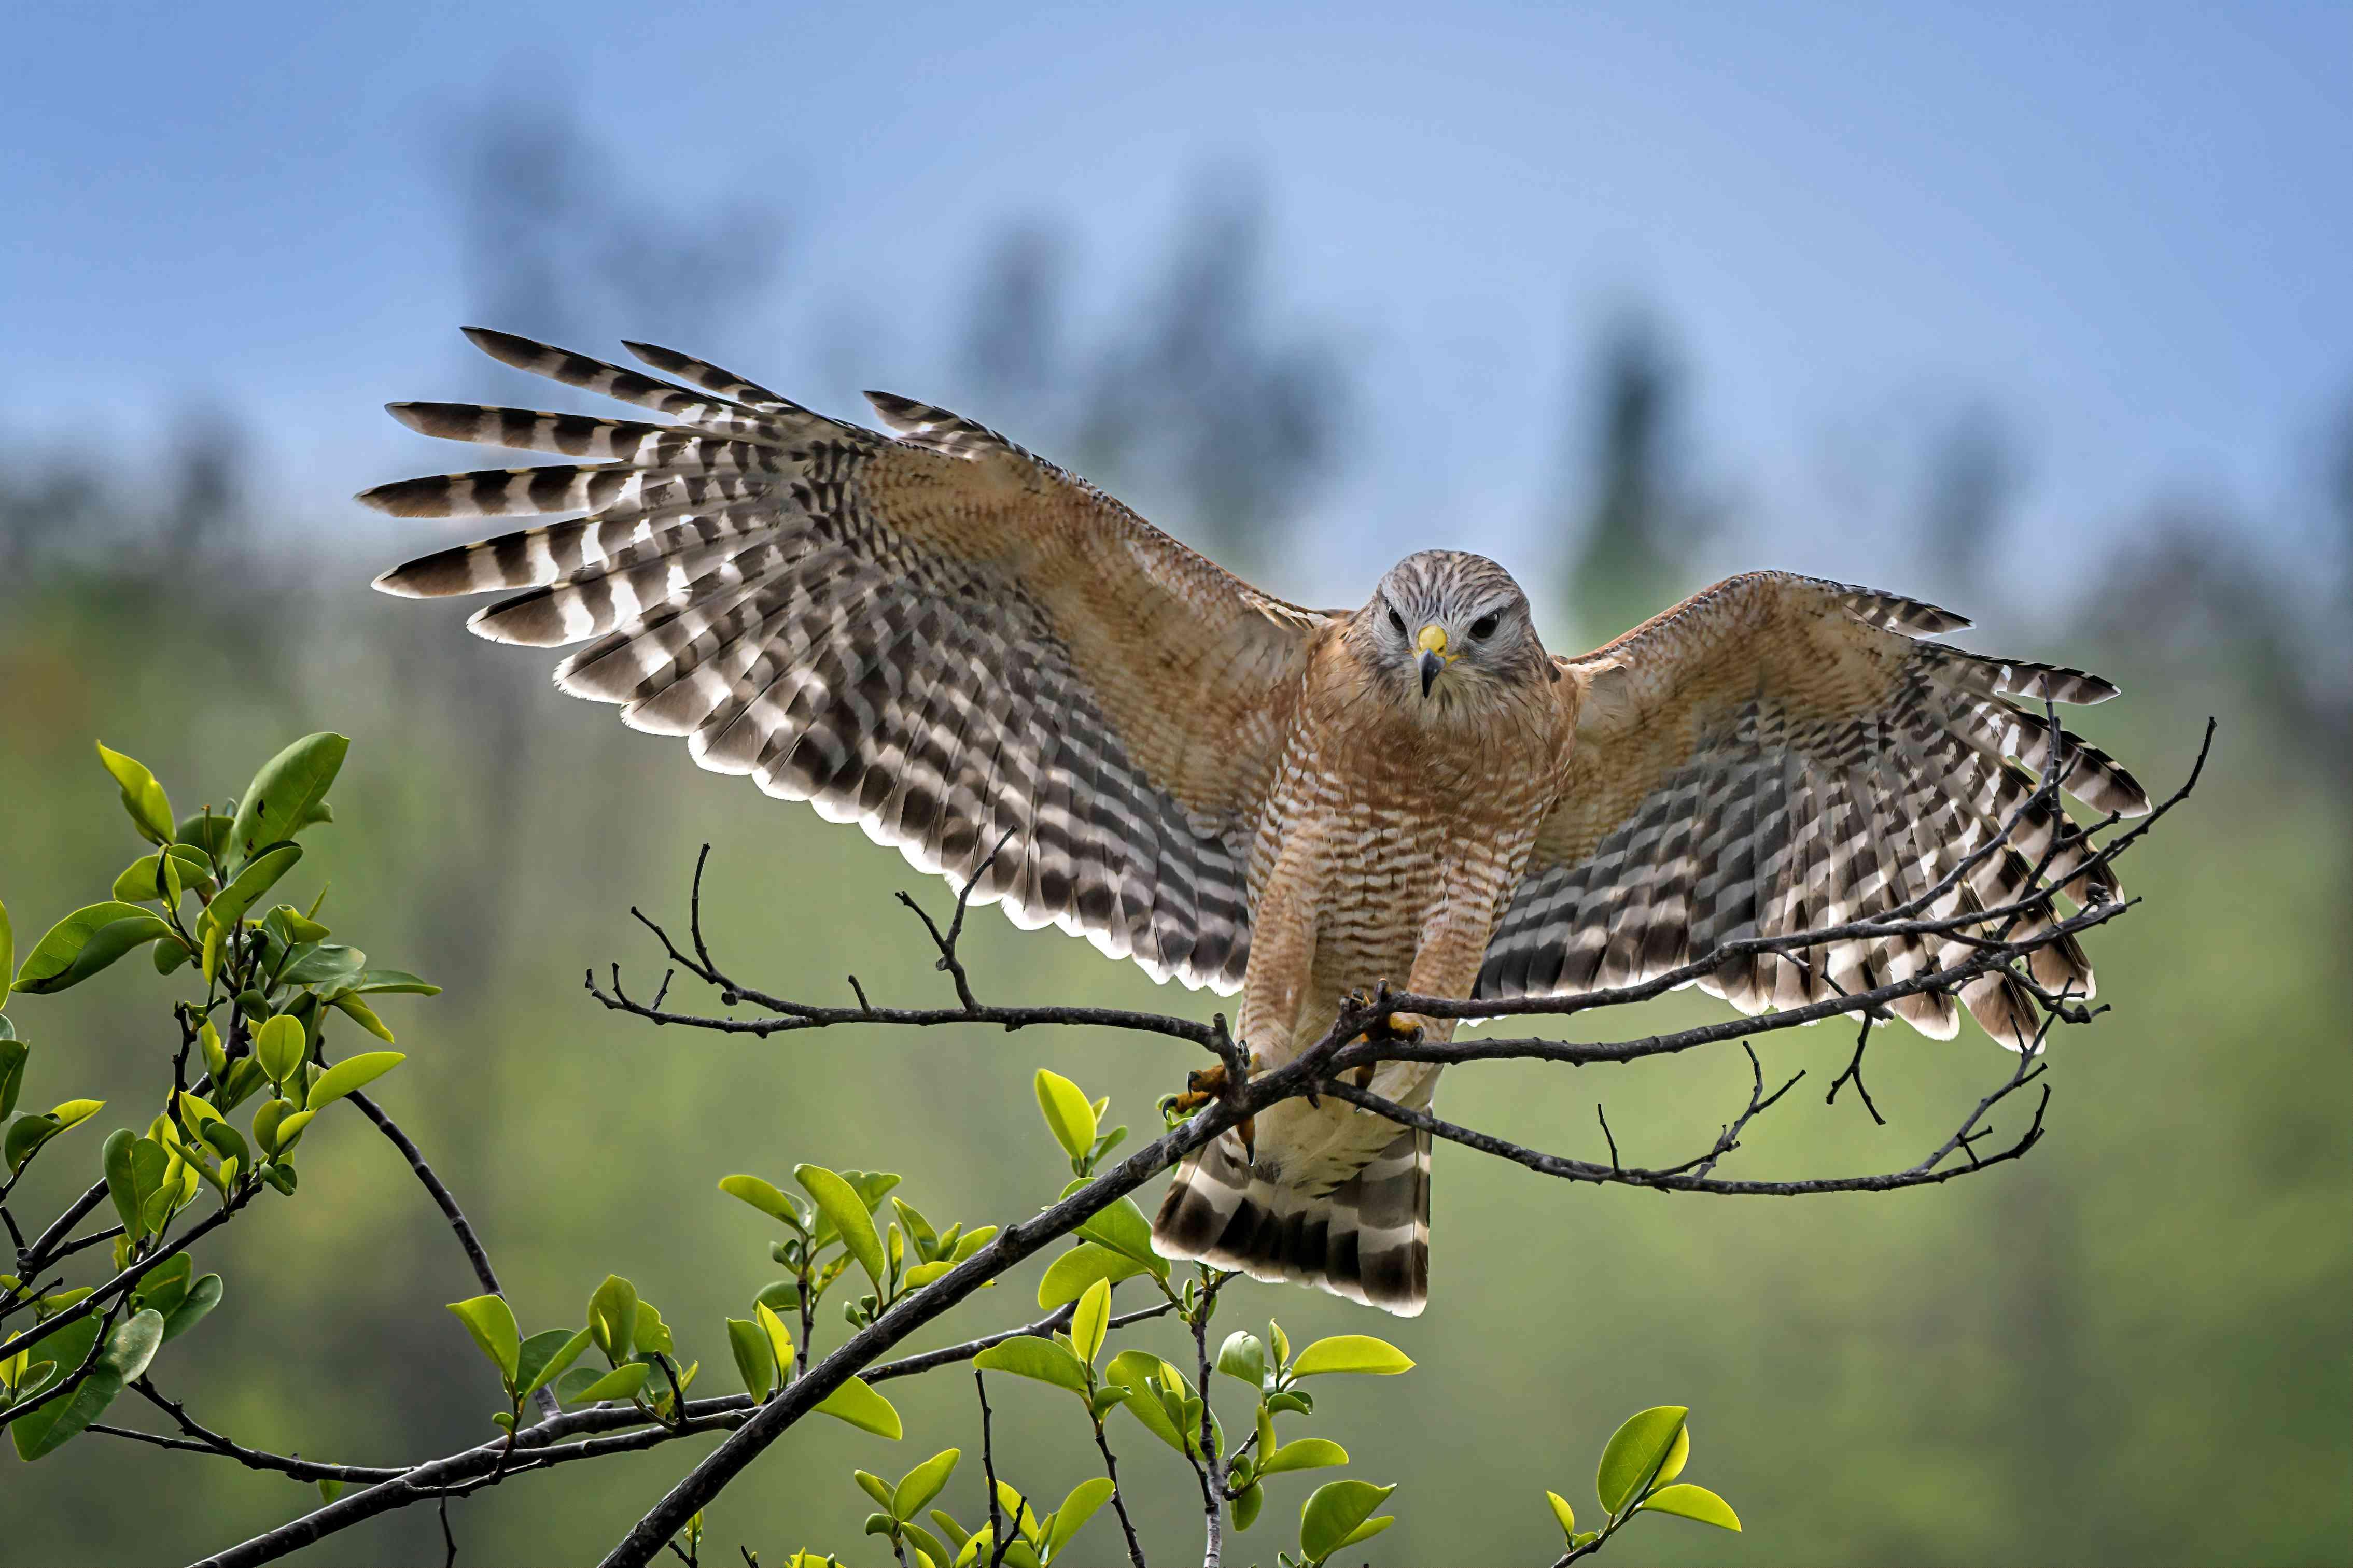 Red-shouldered hawk landing on branch in Green Cay Wetlands near Boynton Beach, Florida